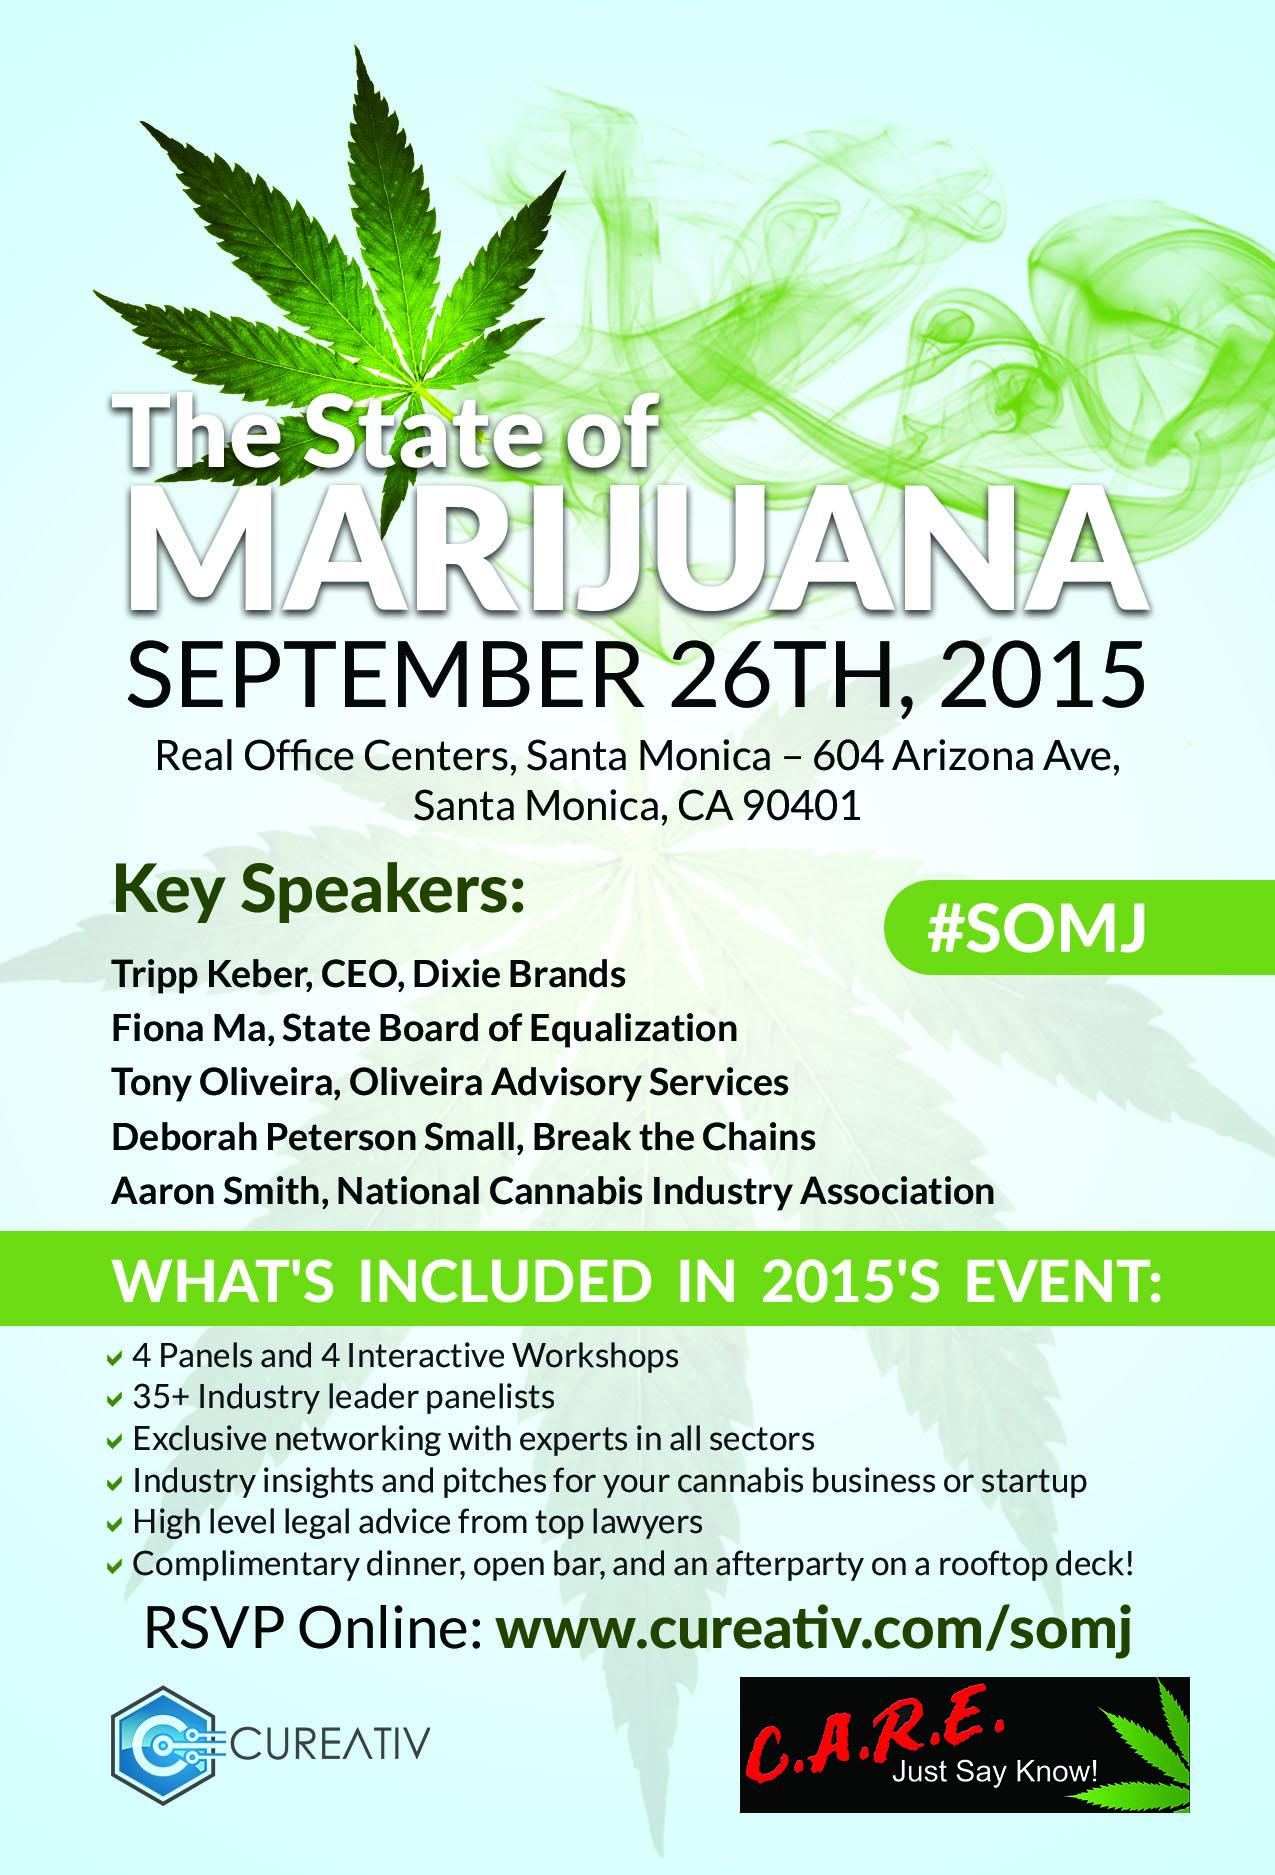 US Activists to Discuss the 'State of Marijuana,' Sept. 26